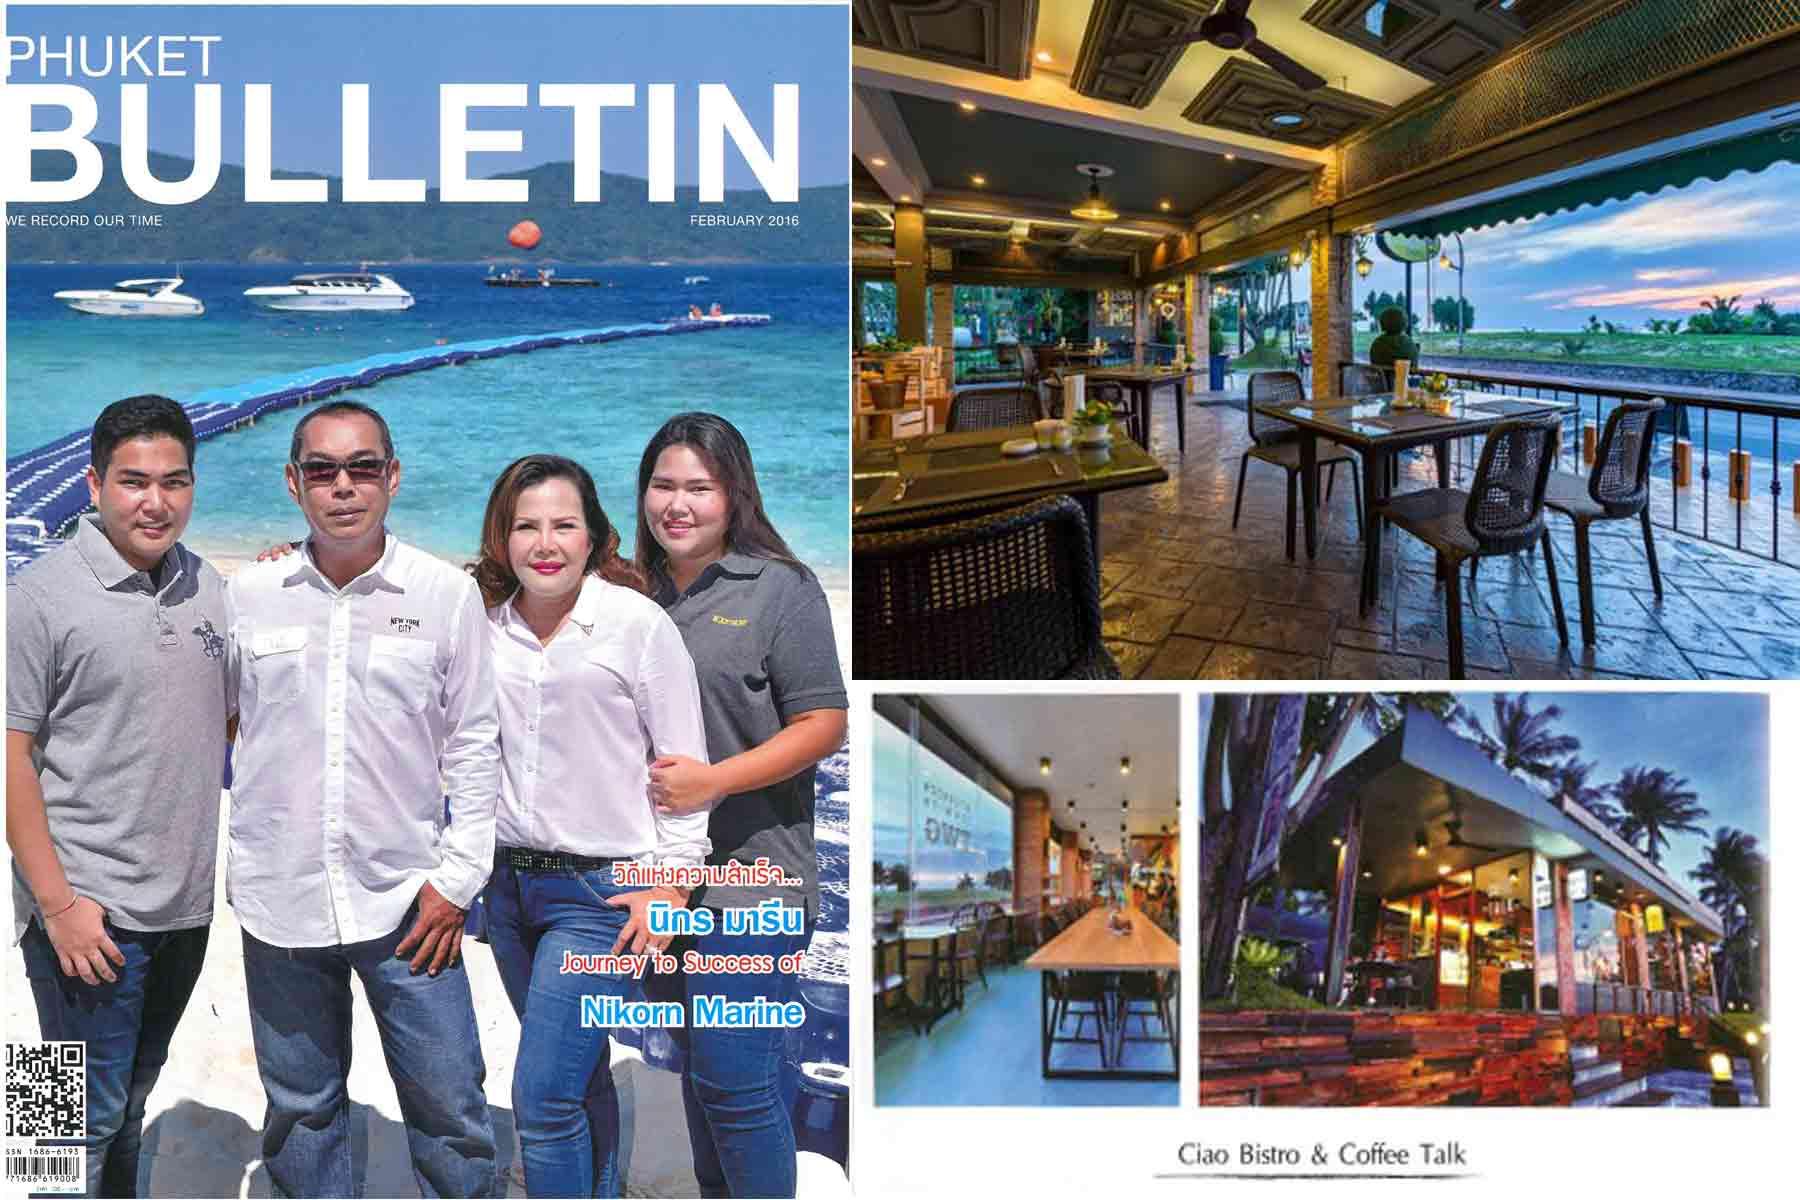 Phuket Bulletin, Ciao Bistro, Coffee Talk Cafe